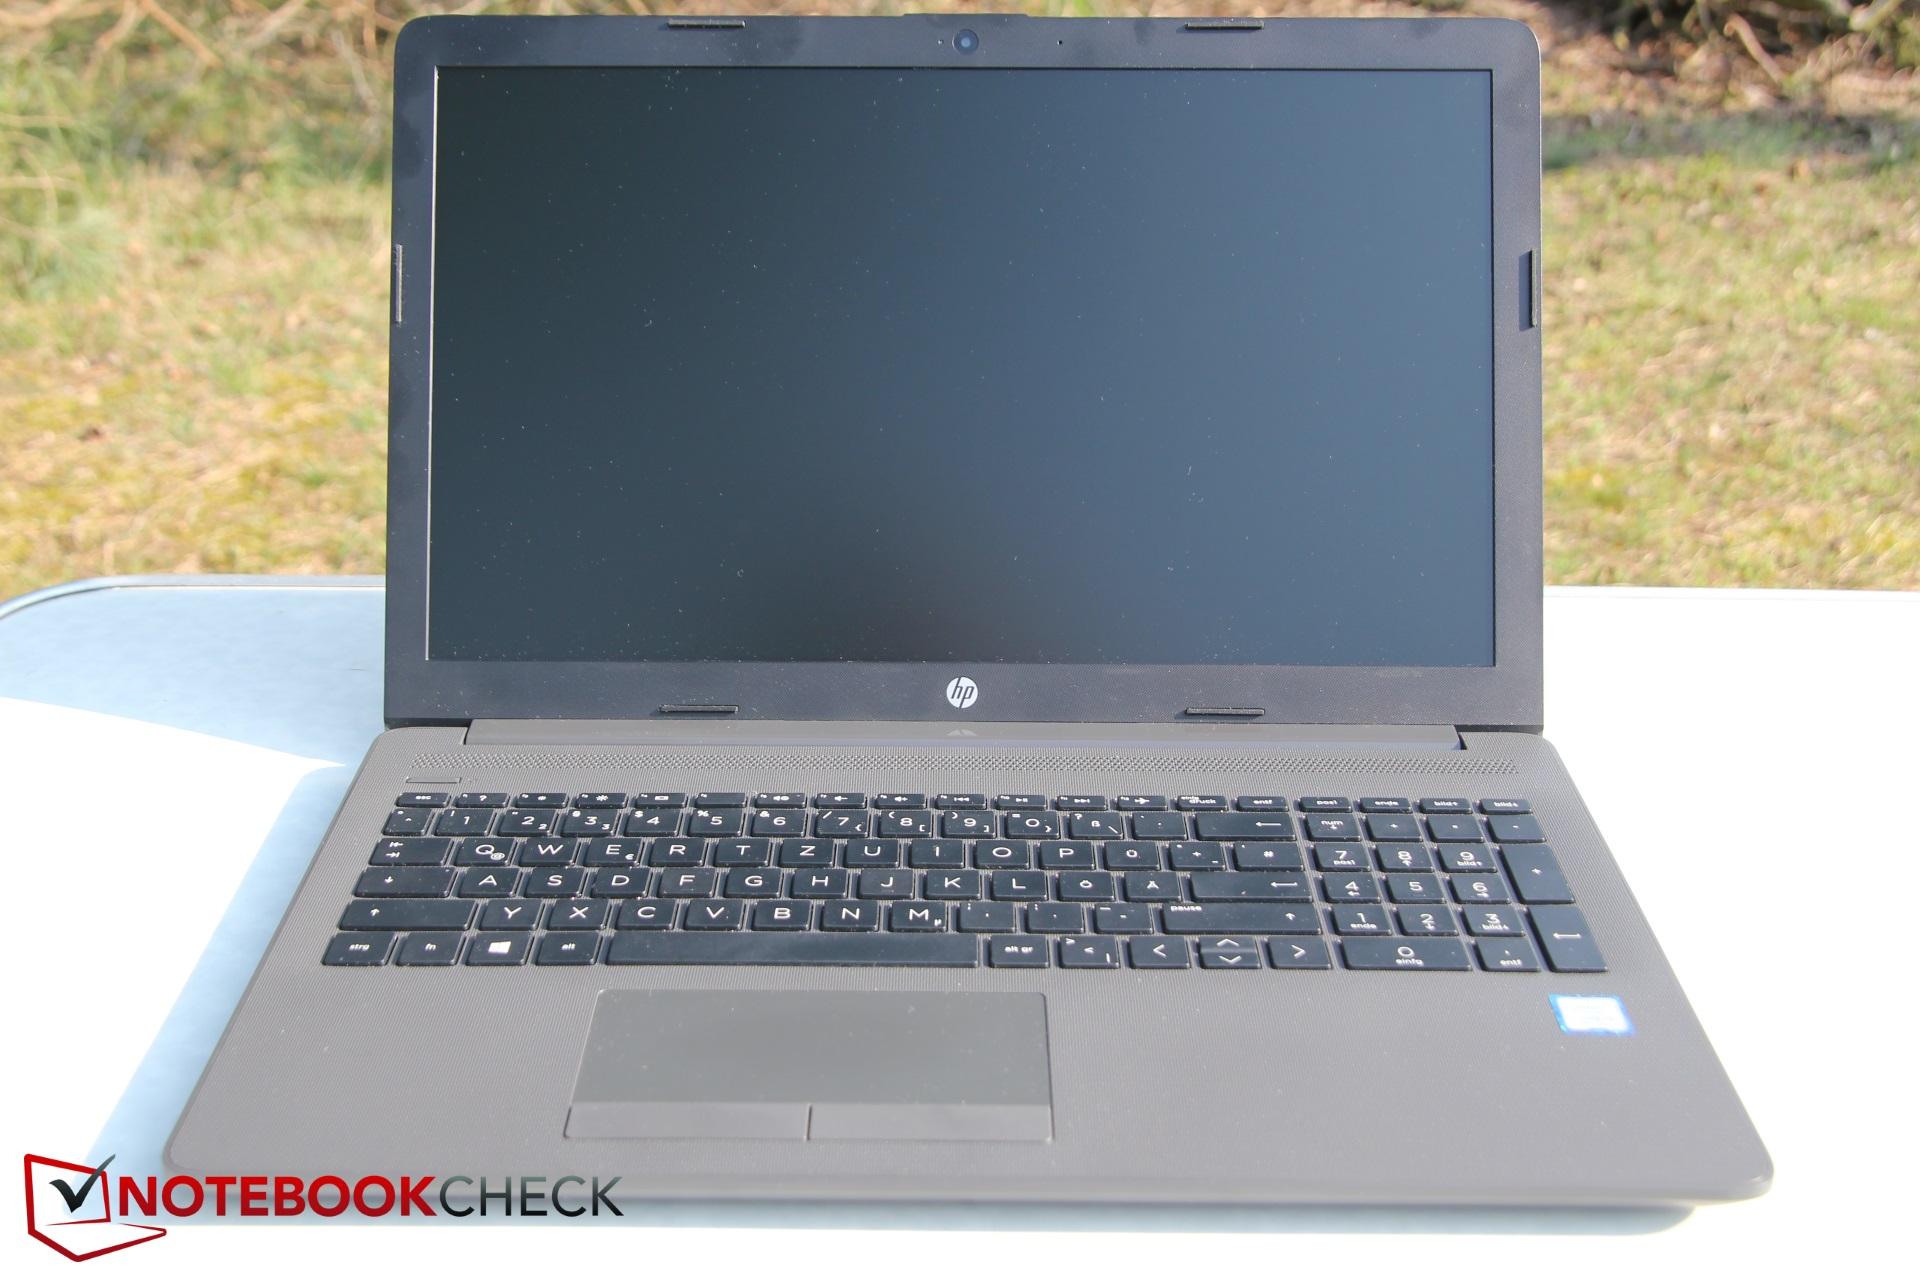 HP 250 G7 (Core i5-8265U, 8 GB RAM, FHD, 512 GB SSD) Laptop Review